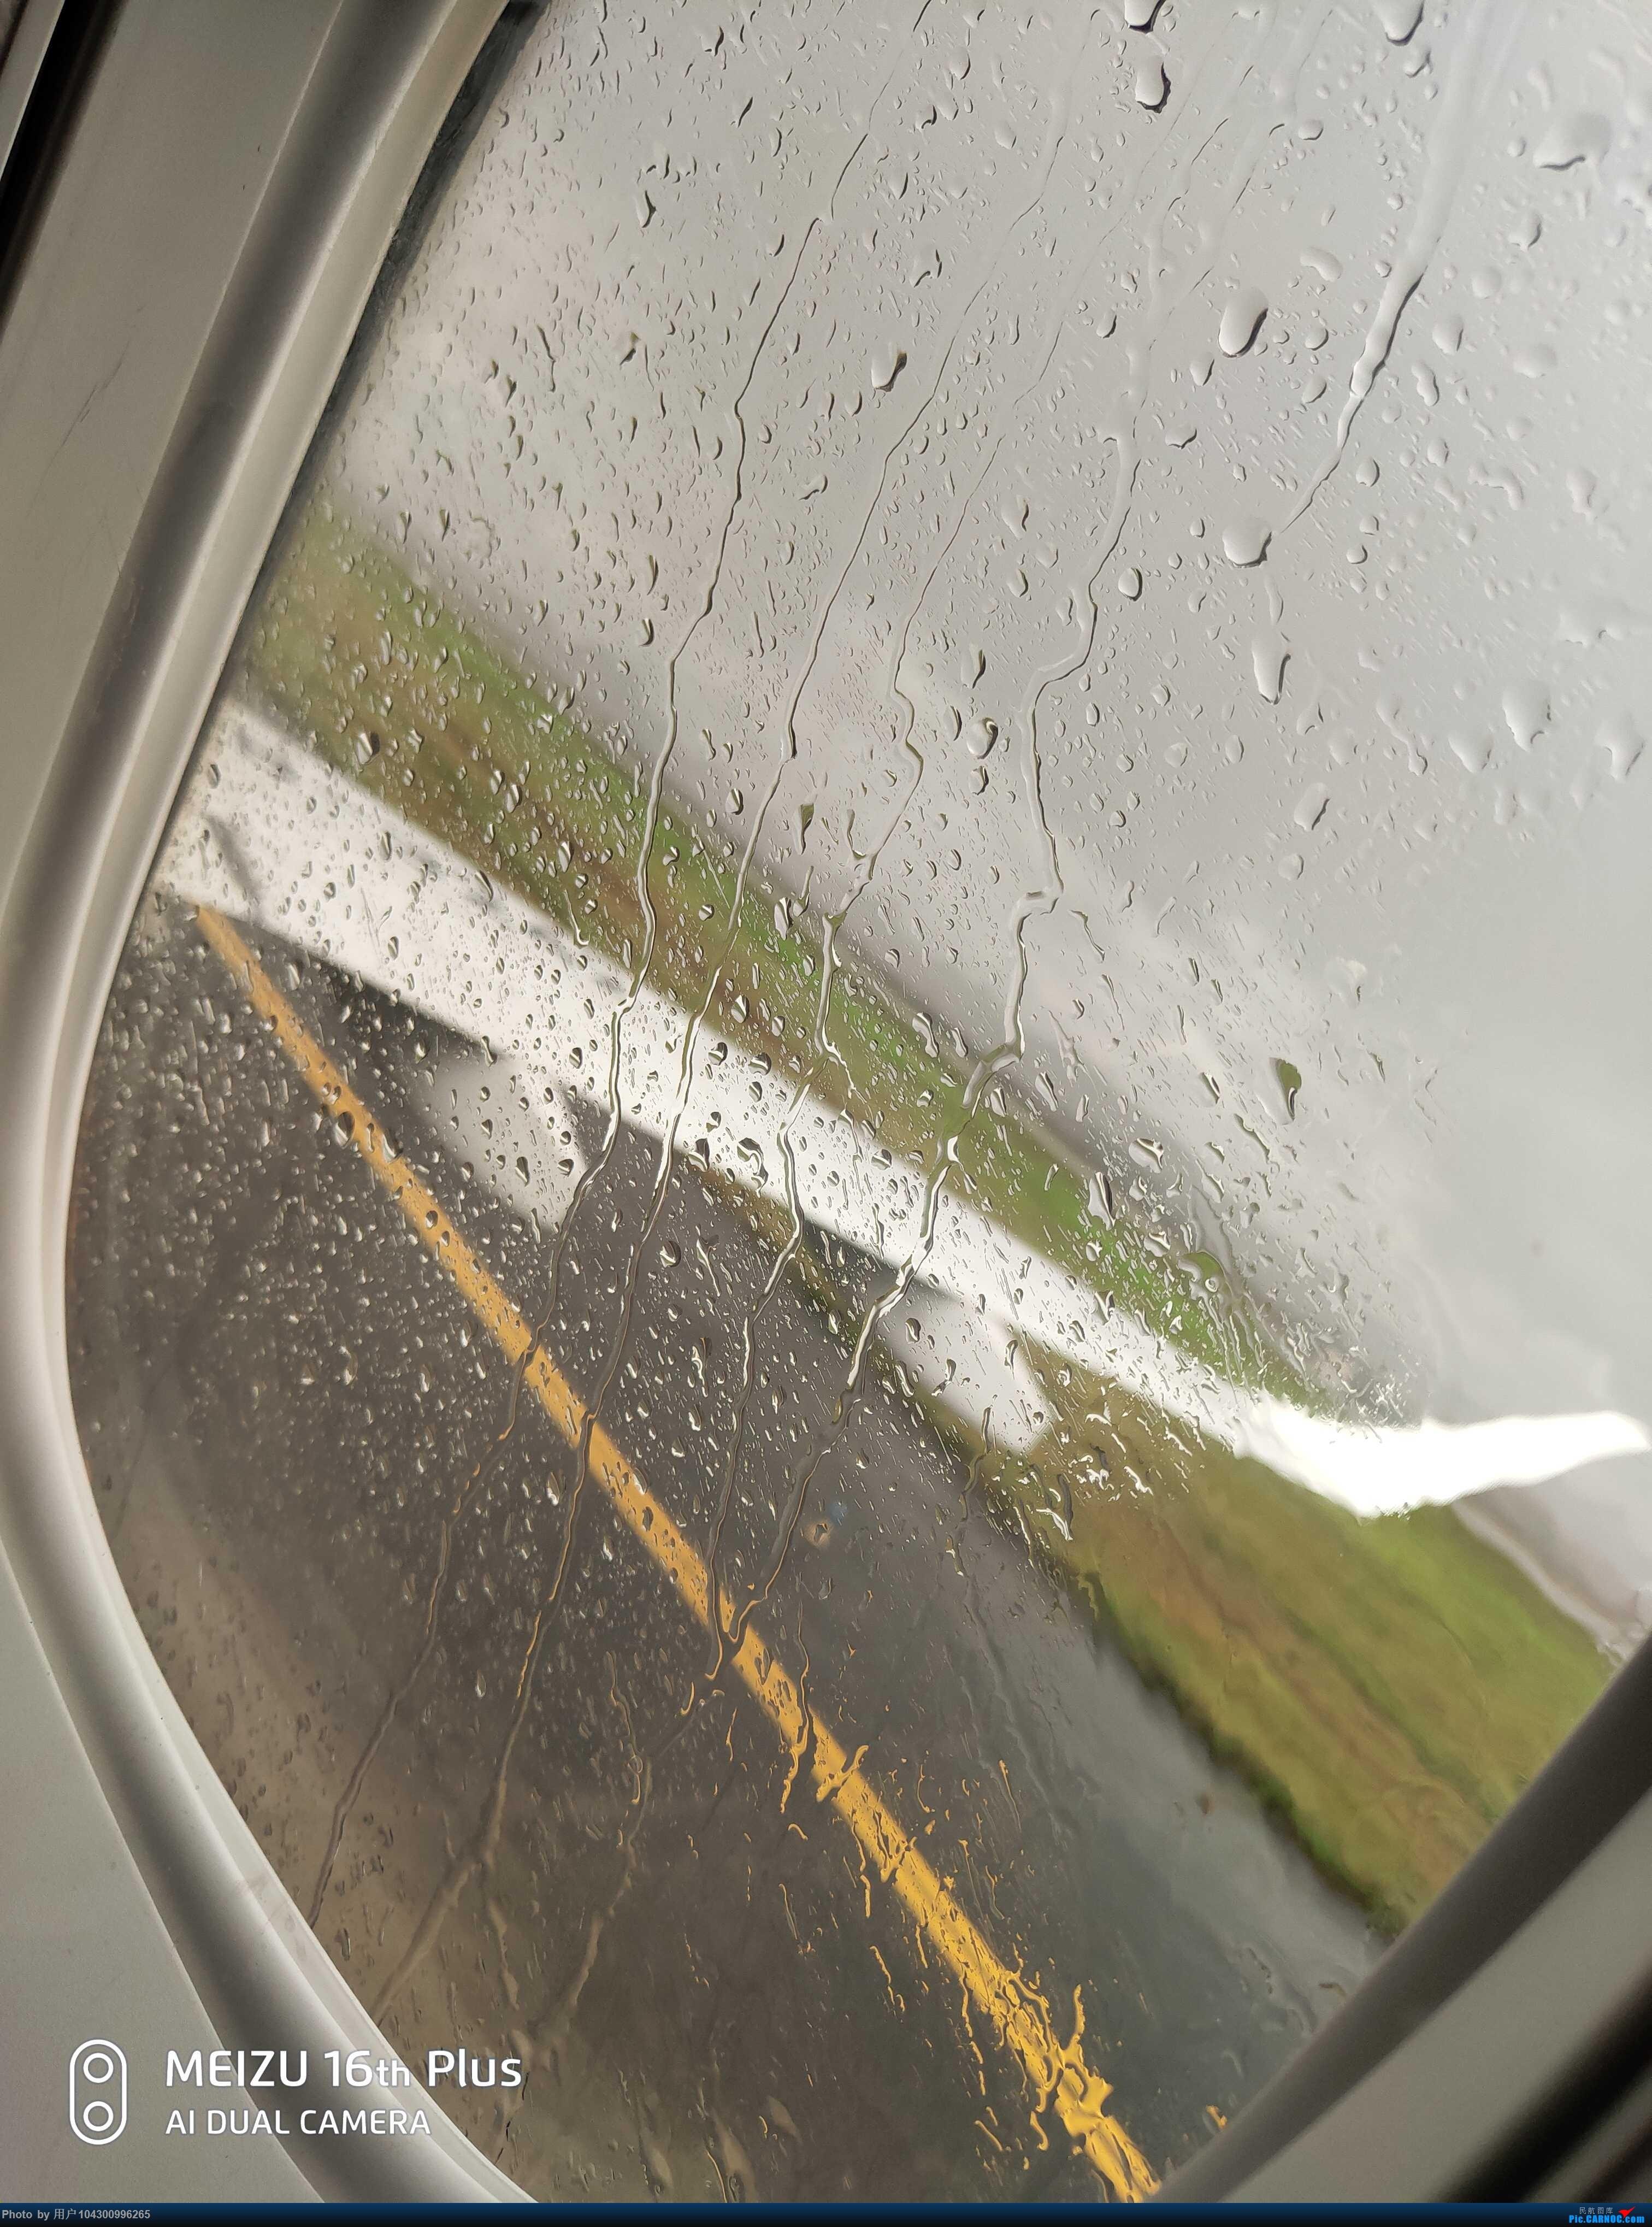 Re:[原创][DM哥飞行游记]-多彩贵州航空贵阳-茅台当日往返 EMBRAER E-190 B-3242 中国贵阳龙洞堡国际机场